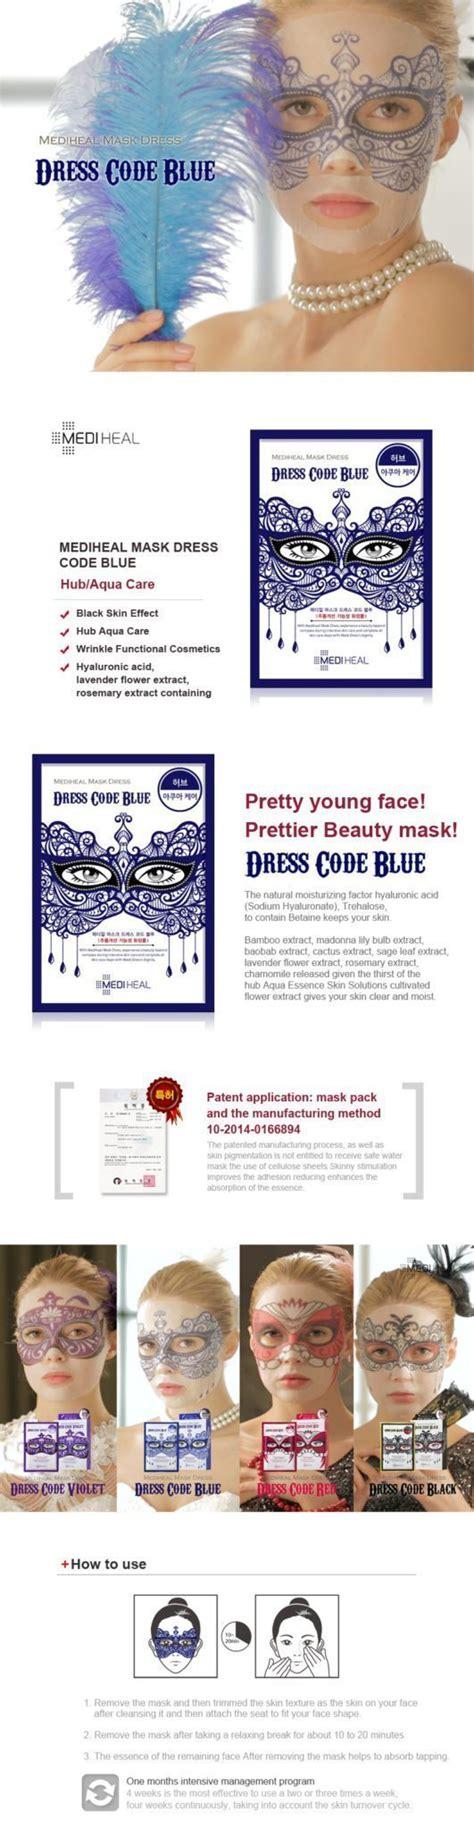 Mediheal Dress Code Mask Korea Masker Wajah Korea mediheal mask dress code blue aqua care seoul next by you malaysia